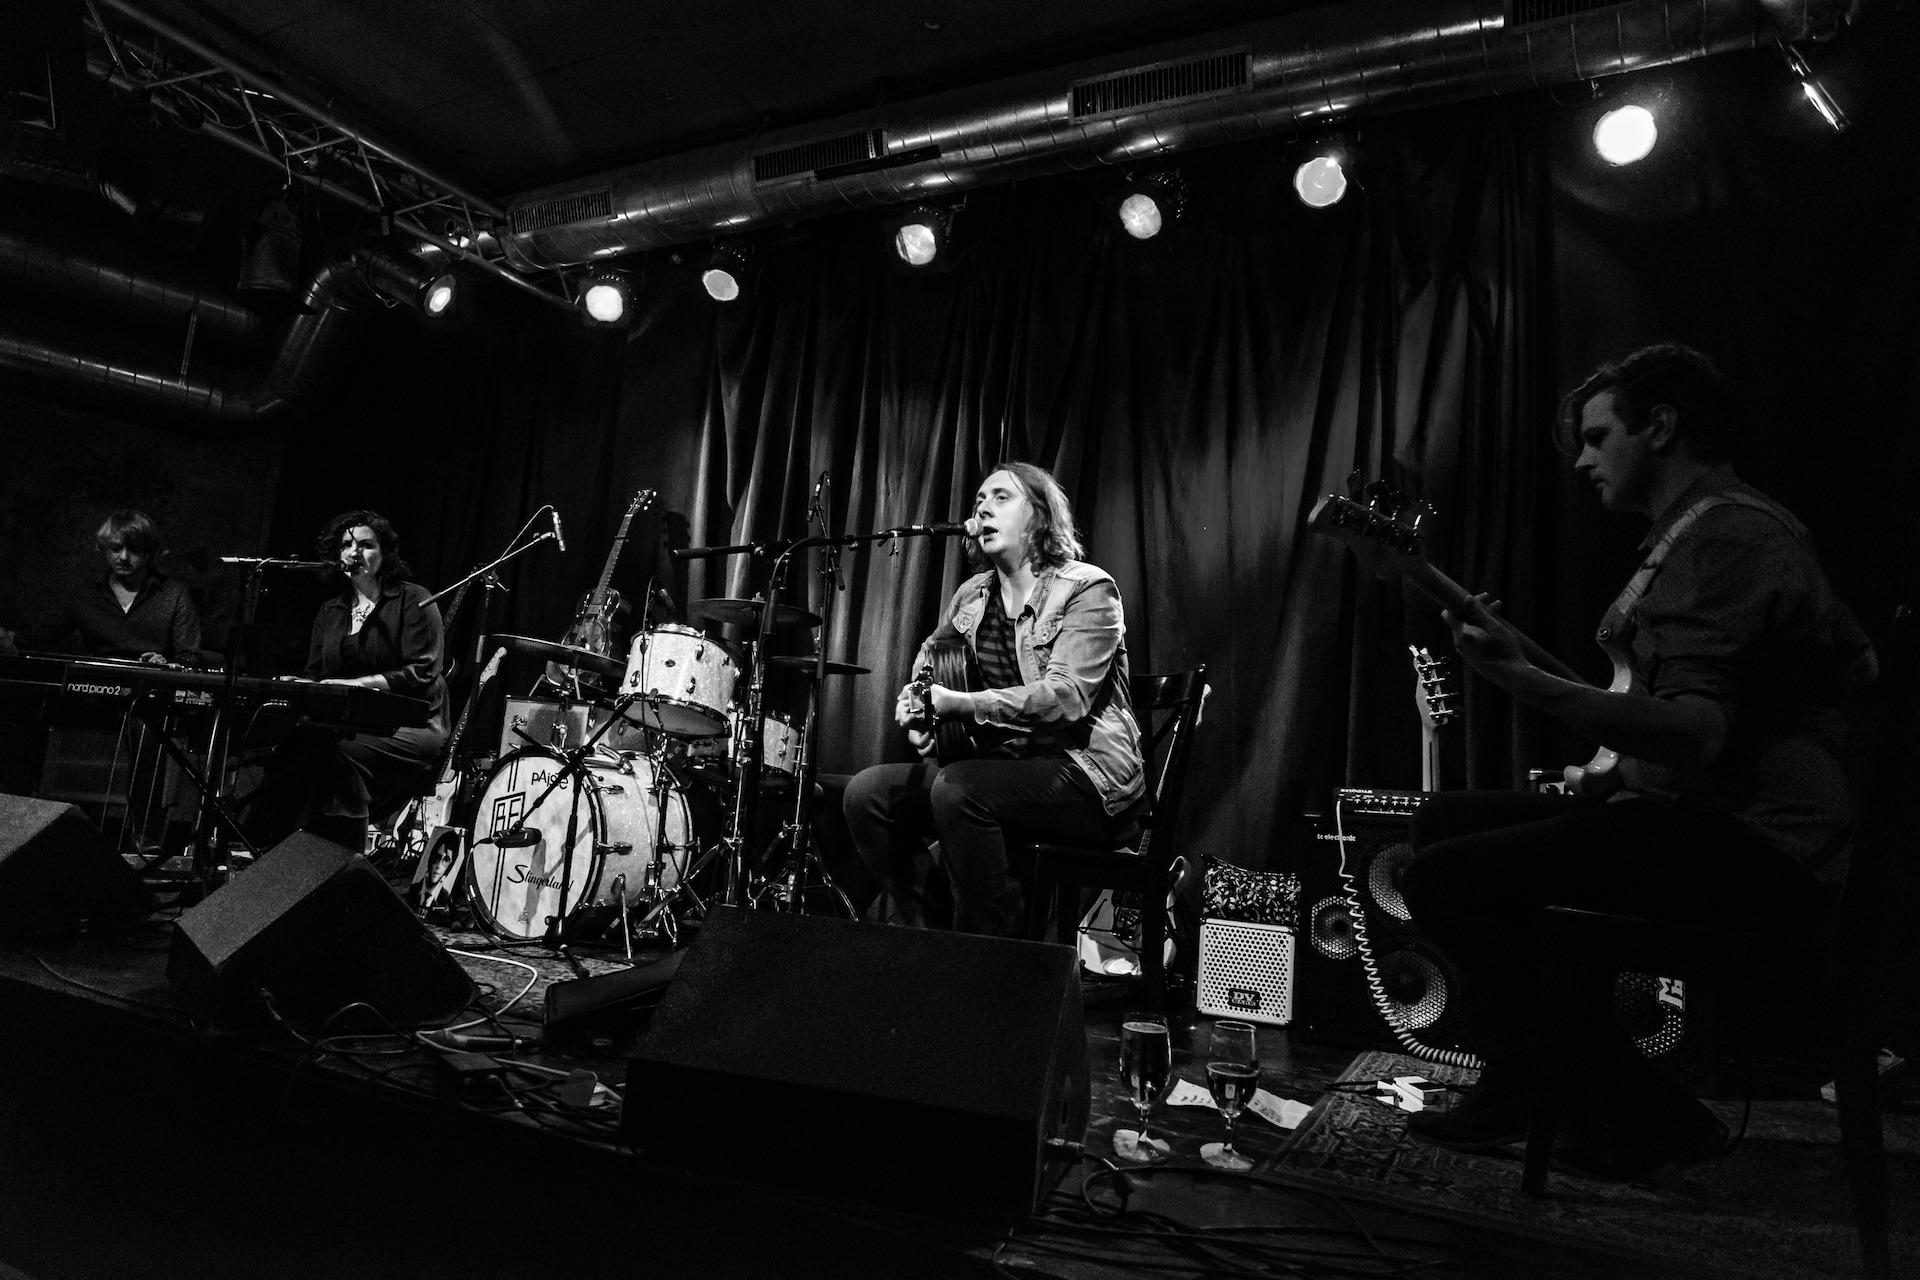 SRF 2016 - Anna Mitchell, David Murphy, John Blek, Hassey Brian, Static Roots Festival 2016